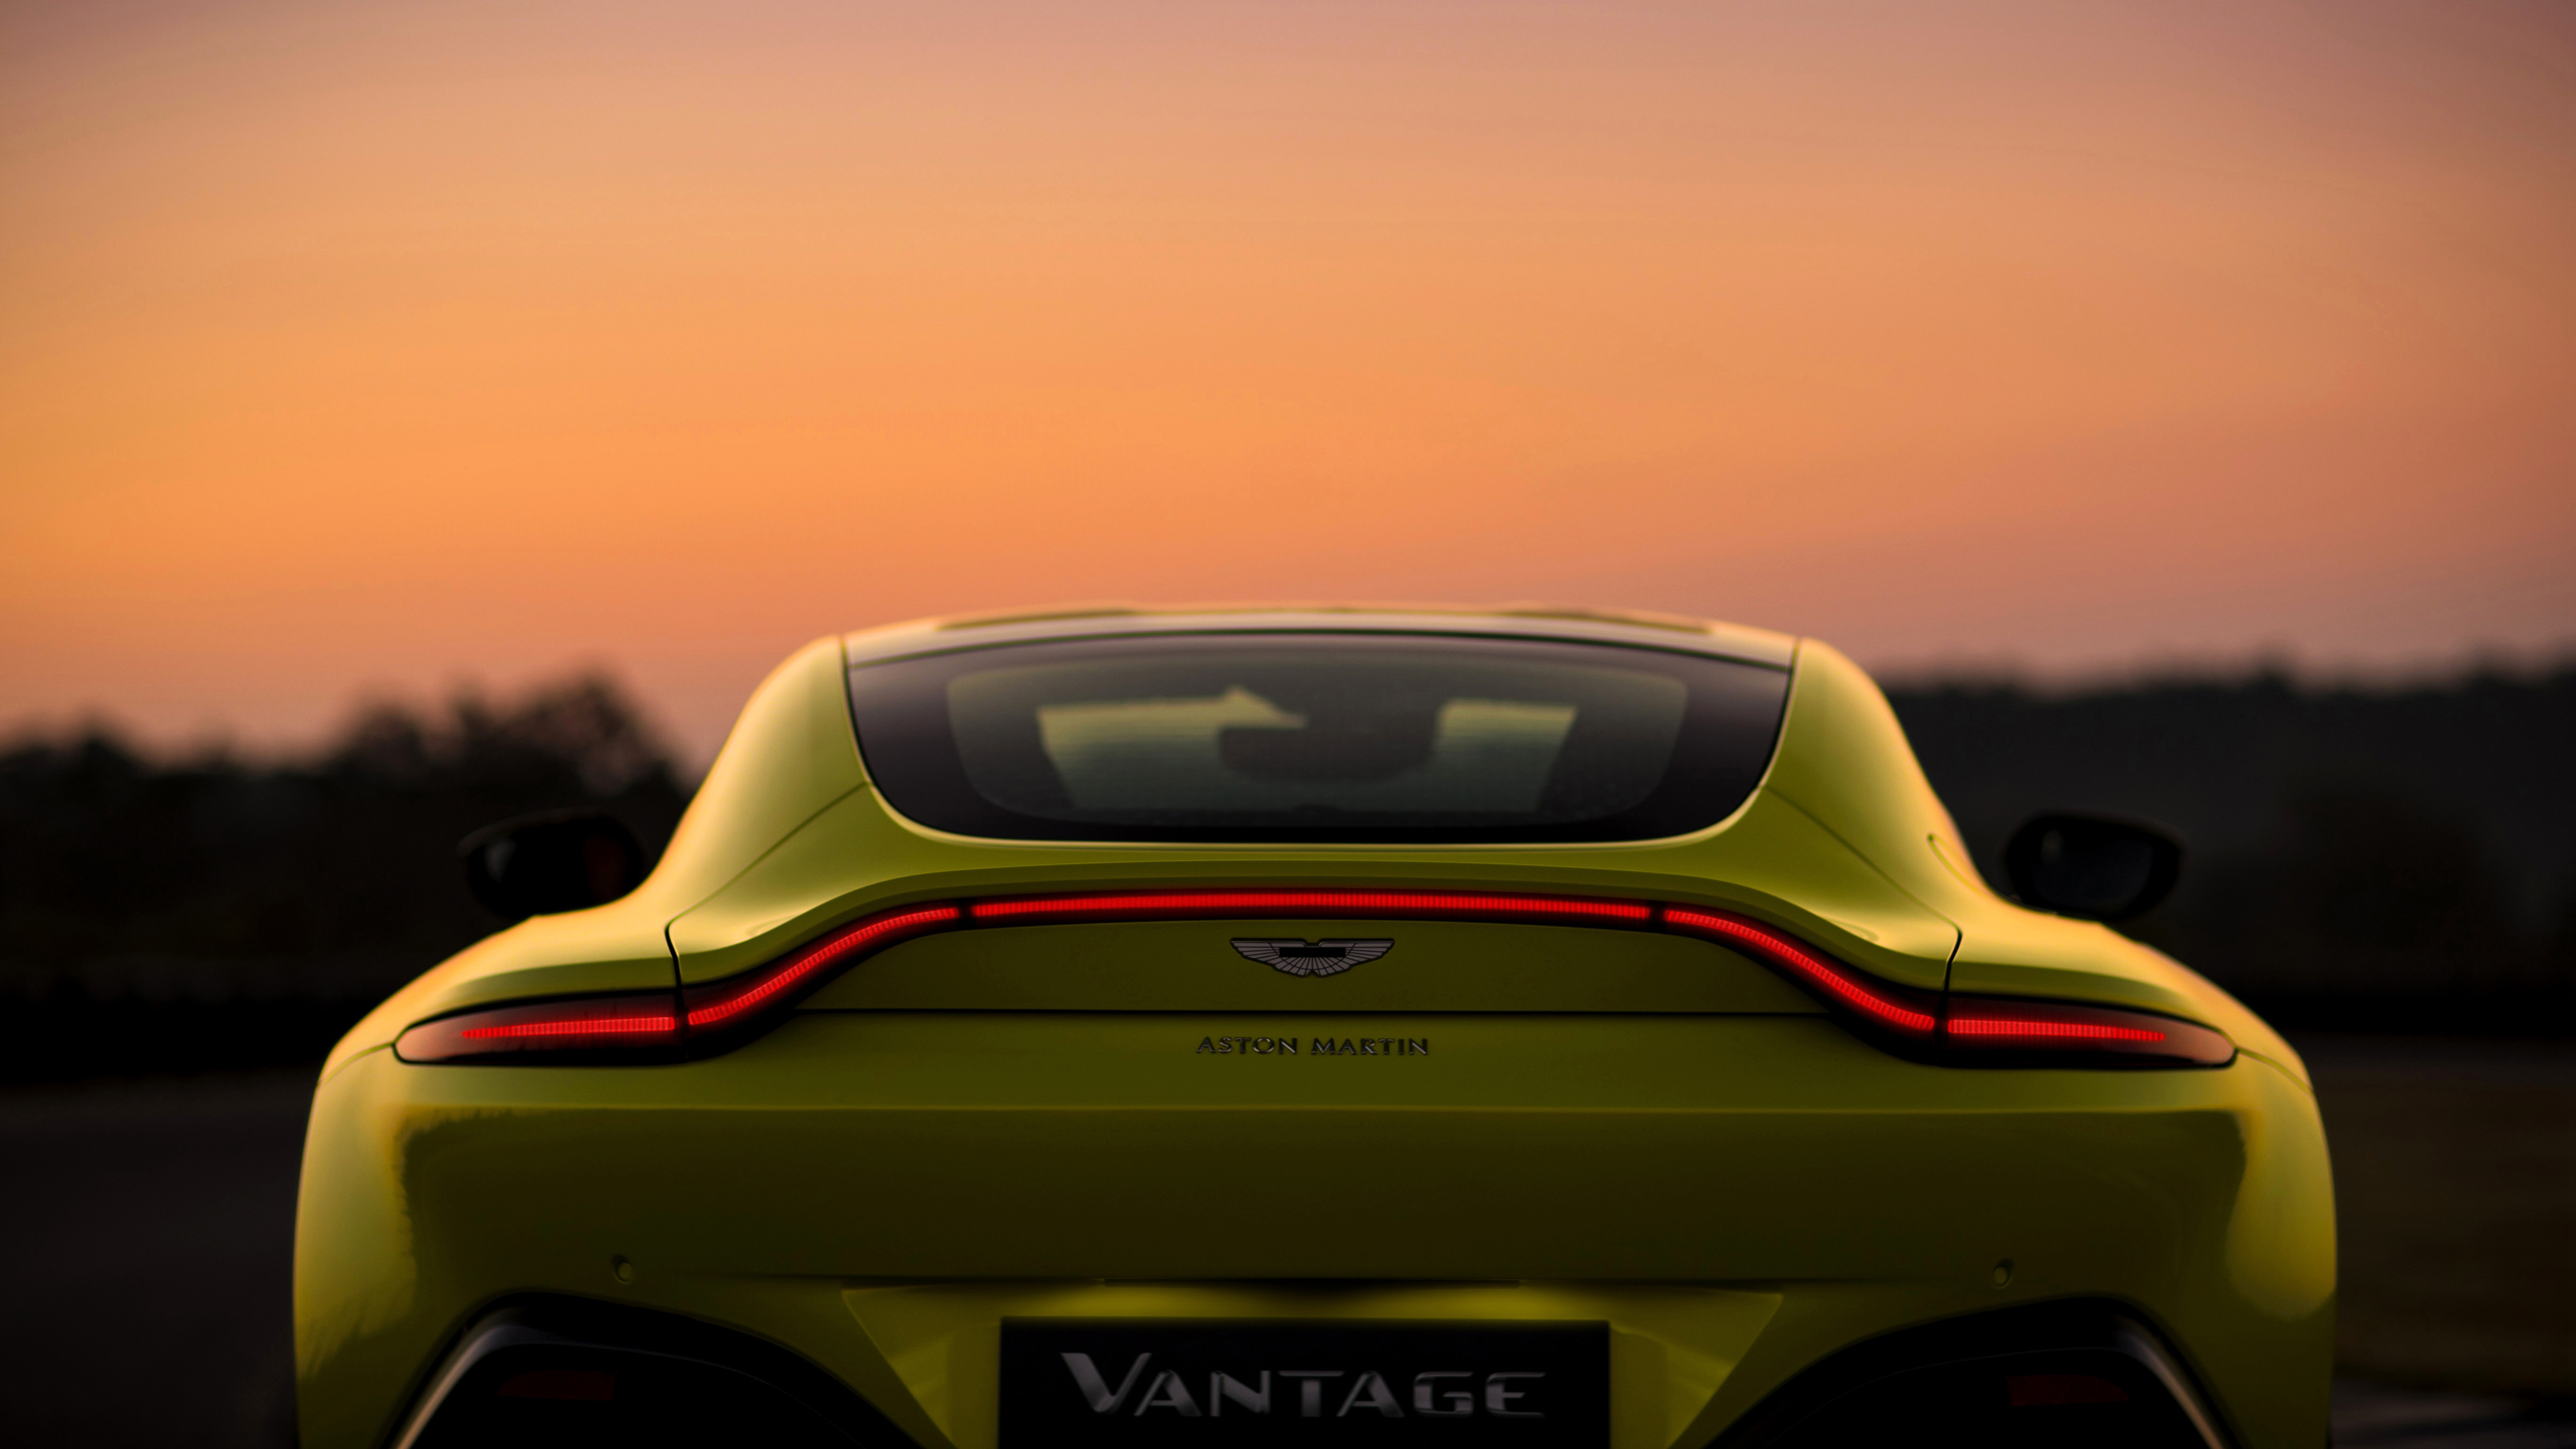 2018 Aston Martin Vantage 4K Wallpapers HD Wallpapers 4096x2304